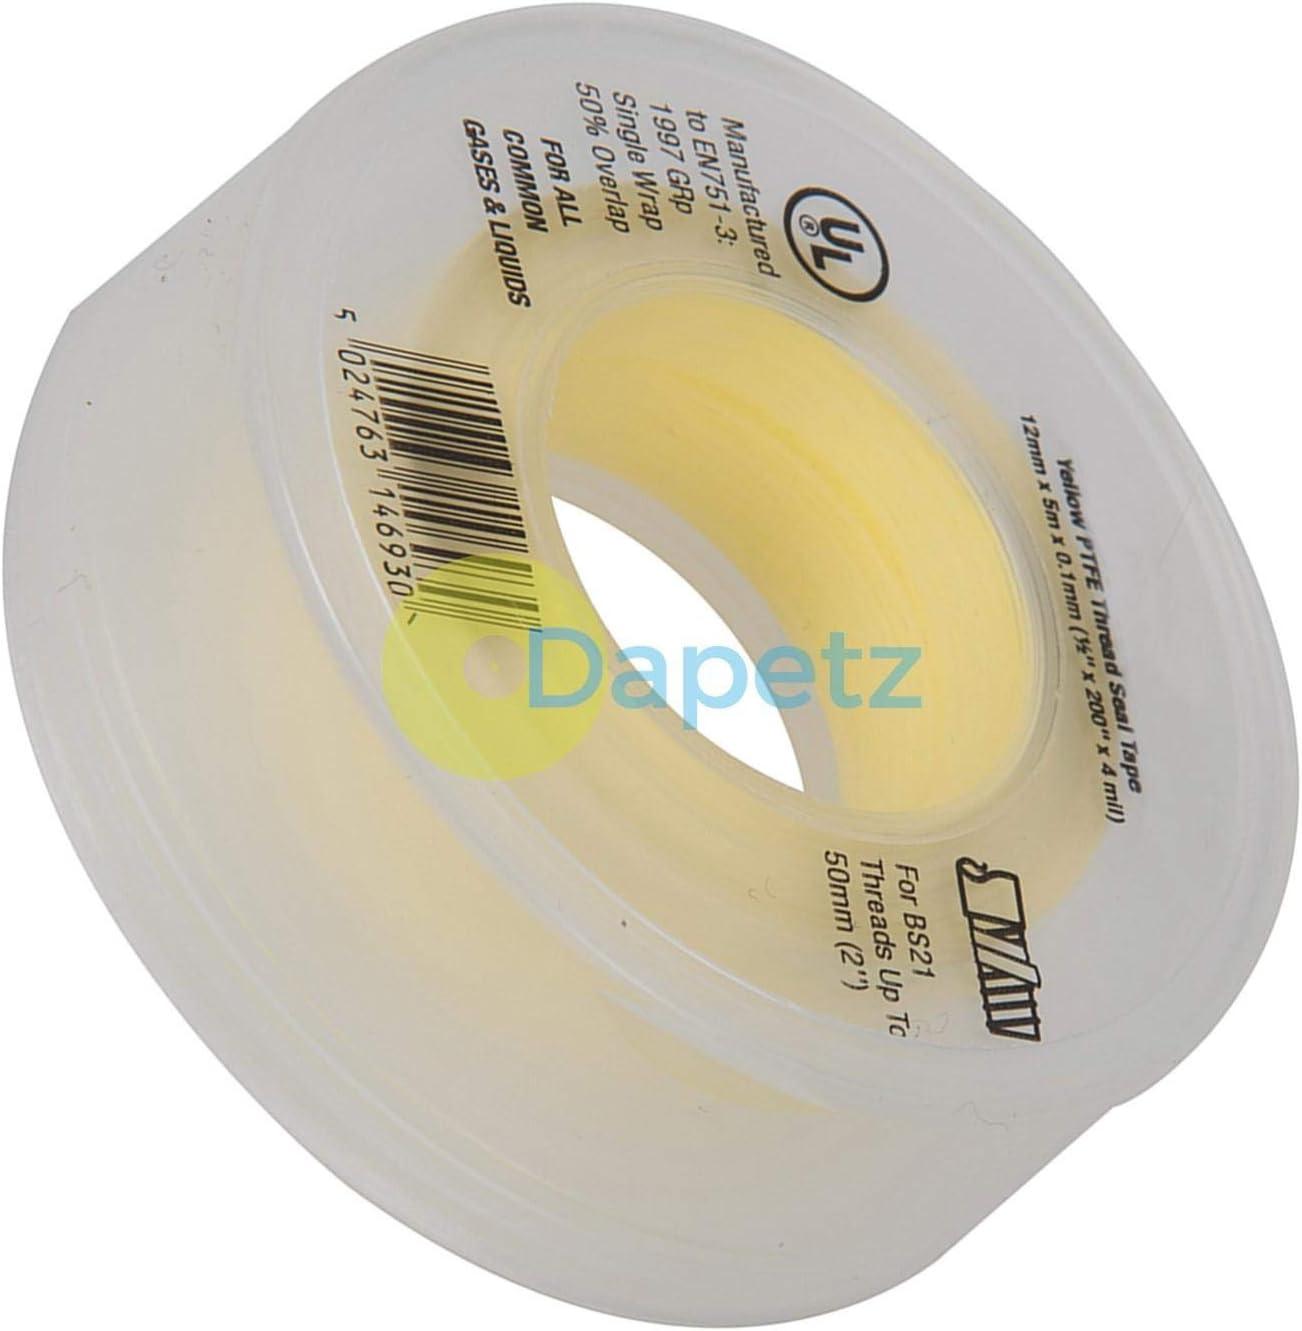 Dapetz /® 1 Roll 12mm x 5m Gas Yellow Plumbers PTFE Thread Seal Tape Plumbing Joint